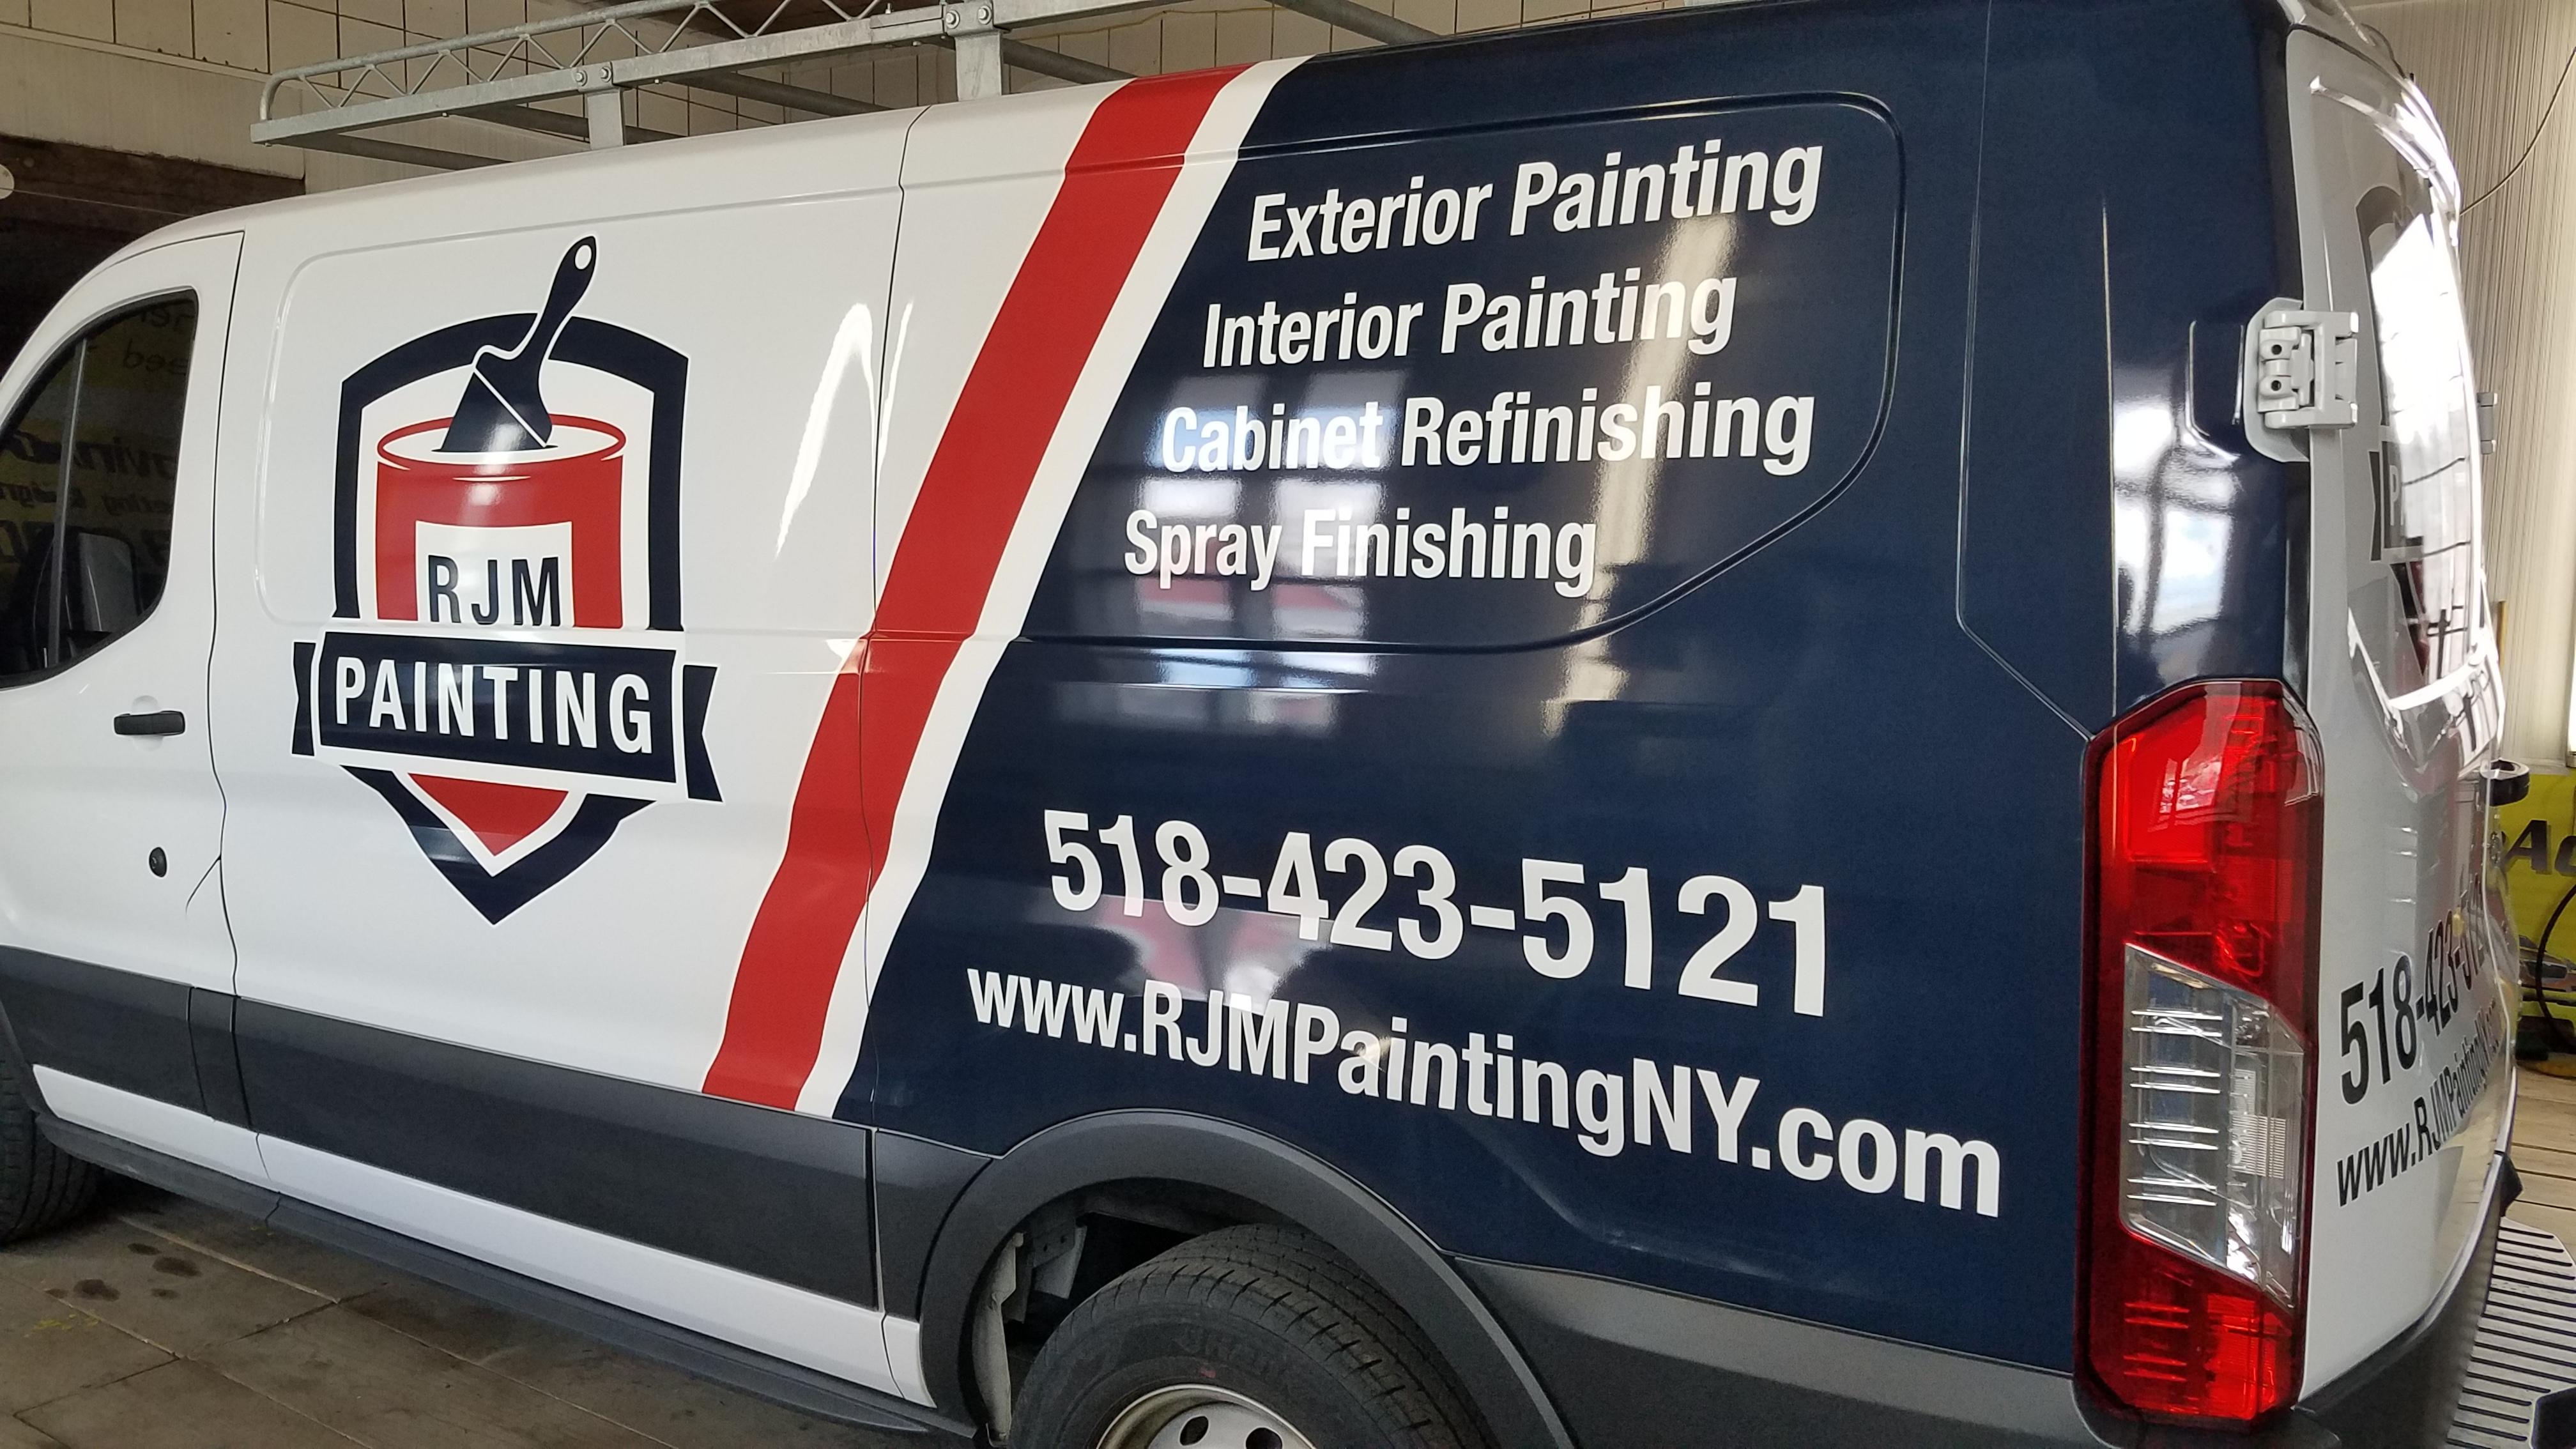 RJM Painting (2)